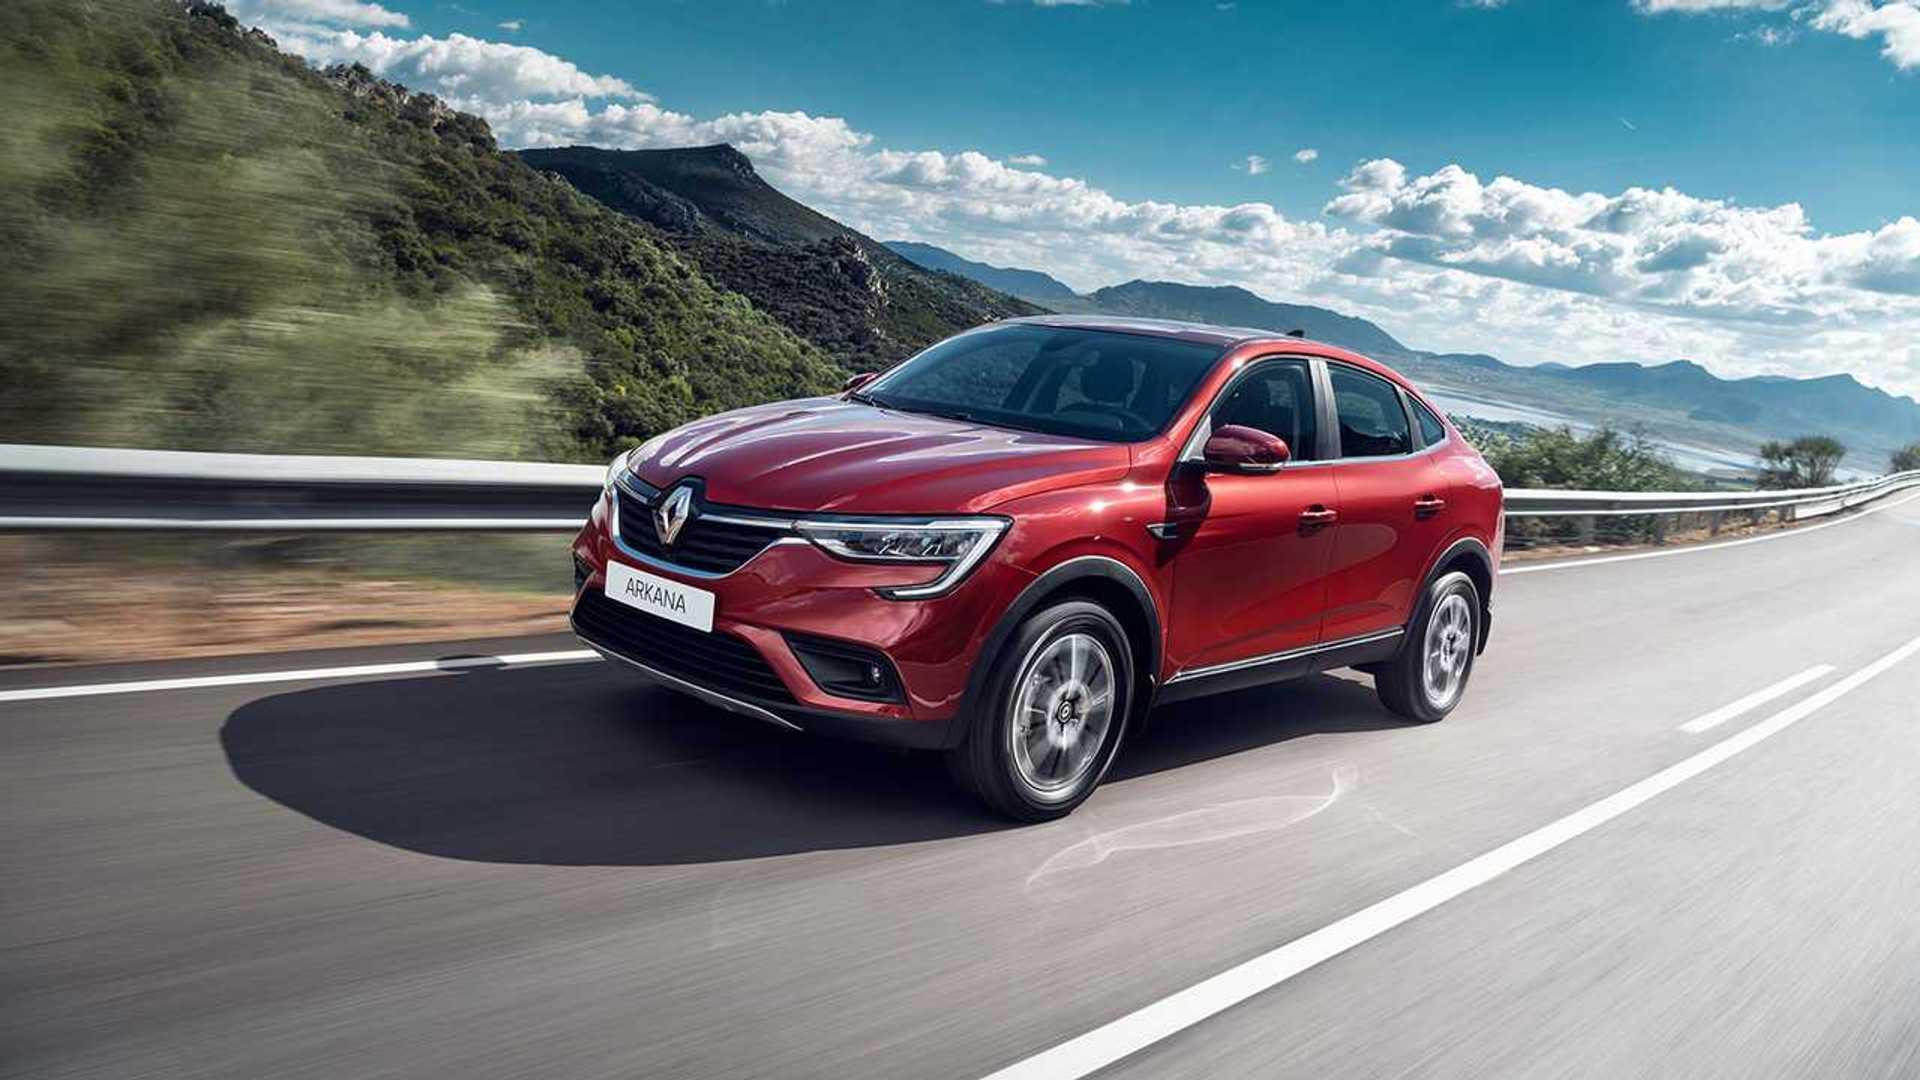 2020 Renault Megane SUV Wallpaper